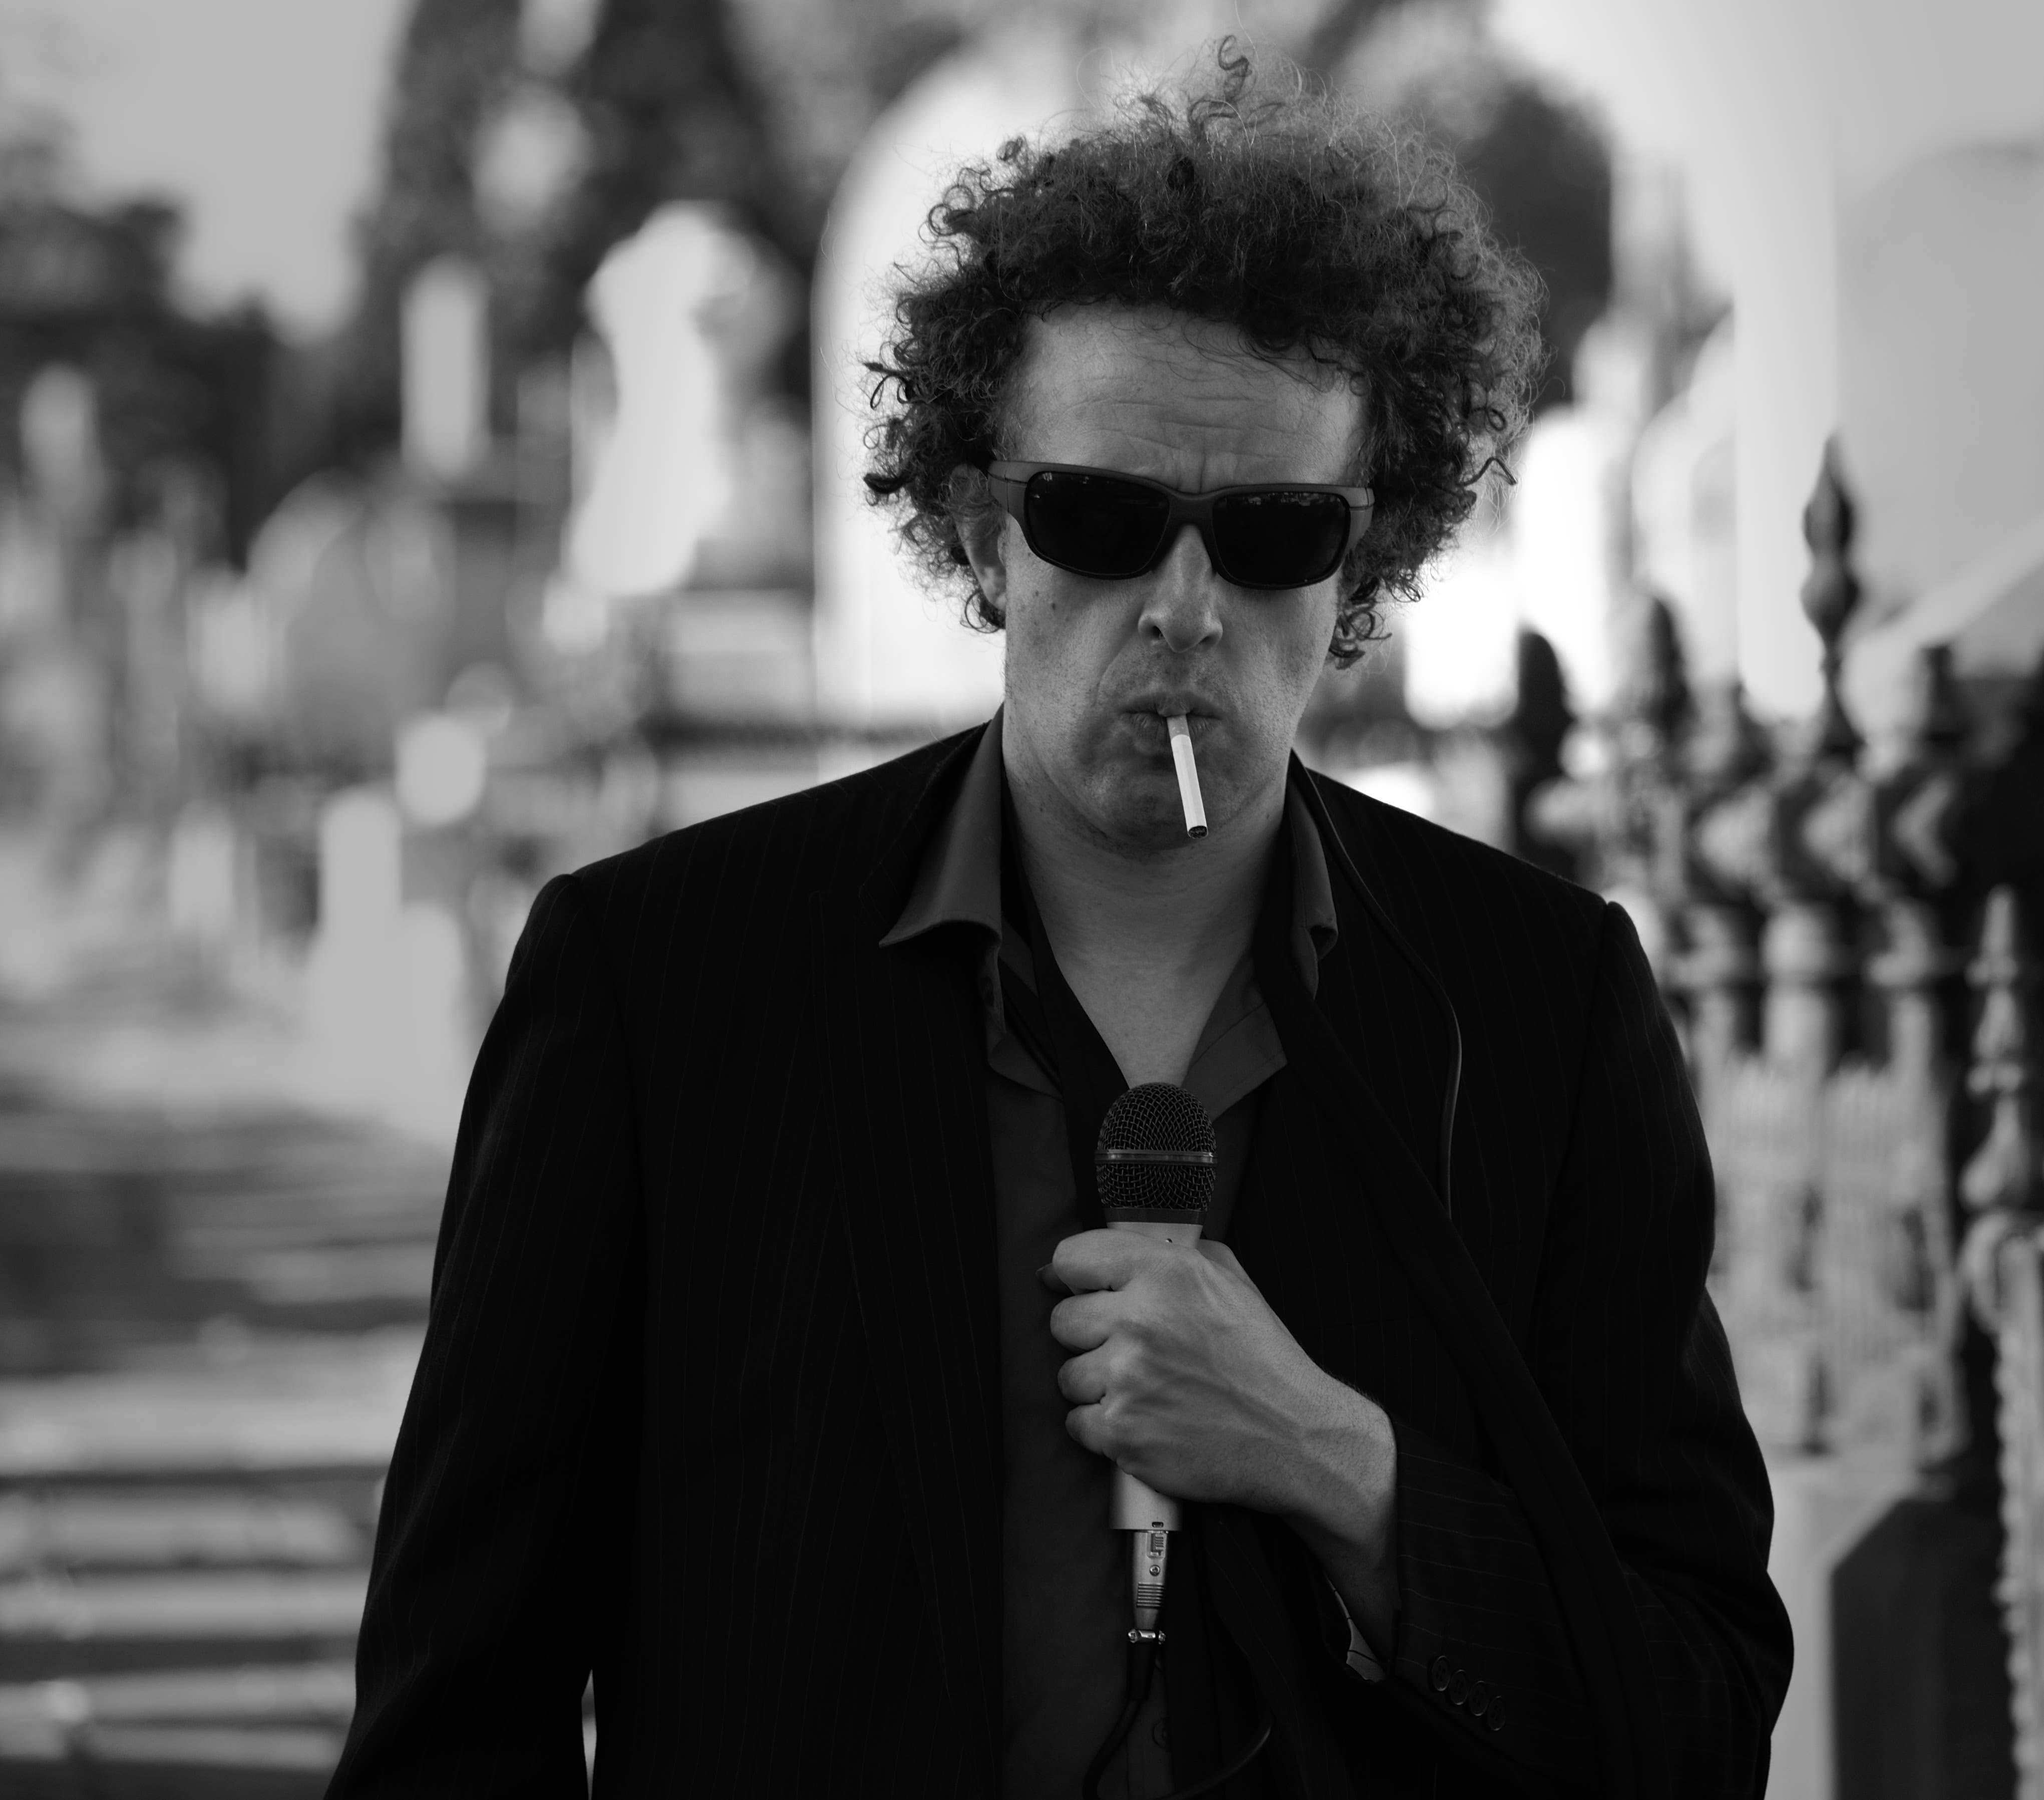 Tony Magnuson - Grieve in Grieve out